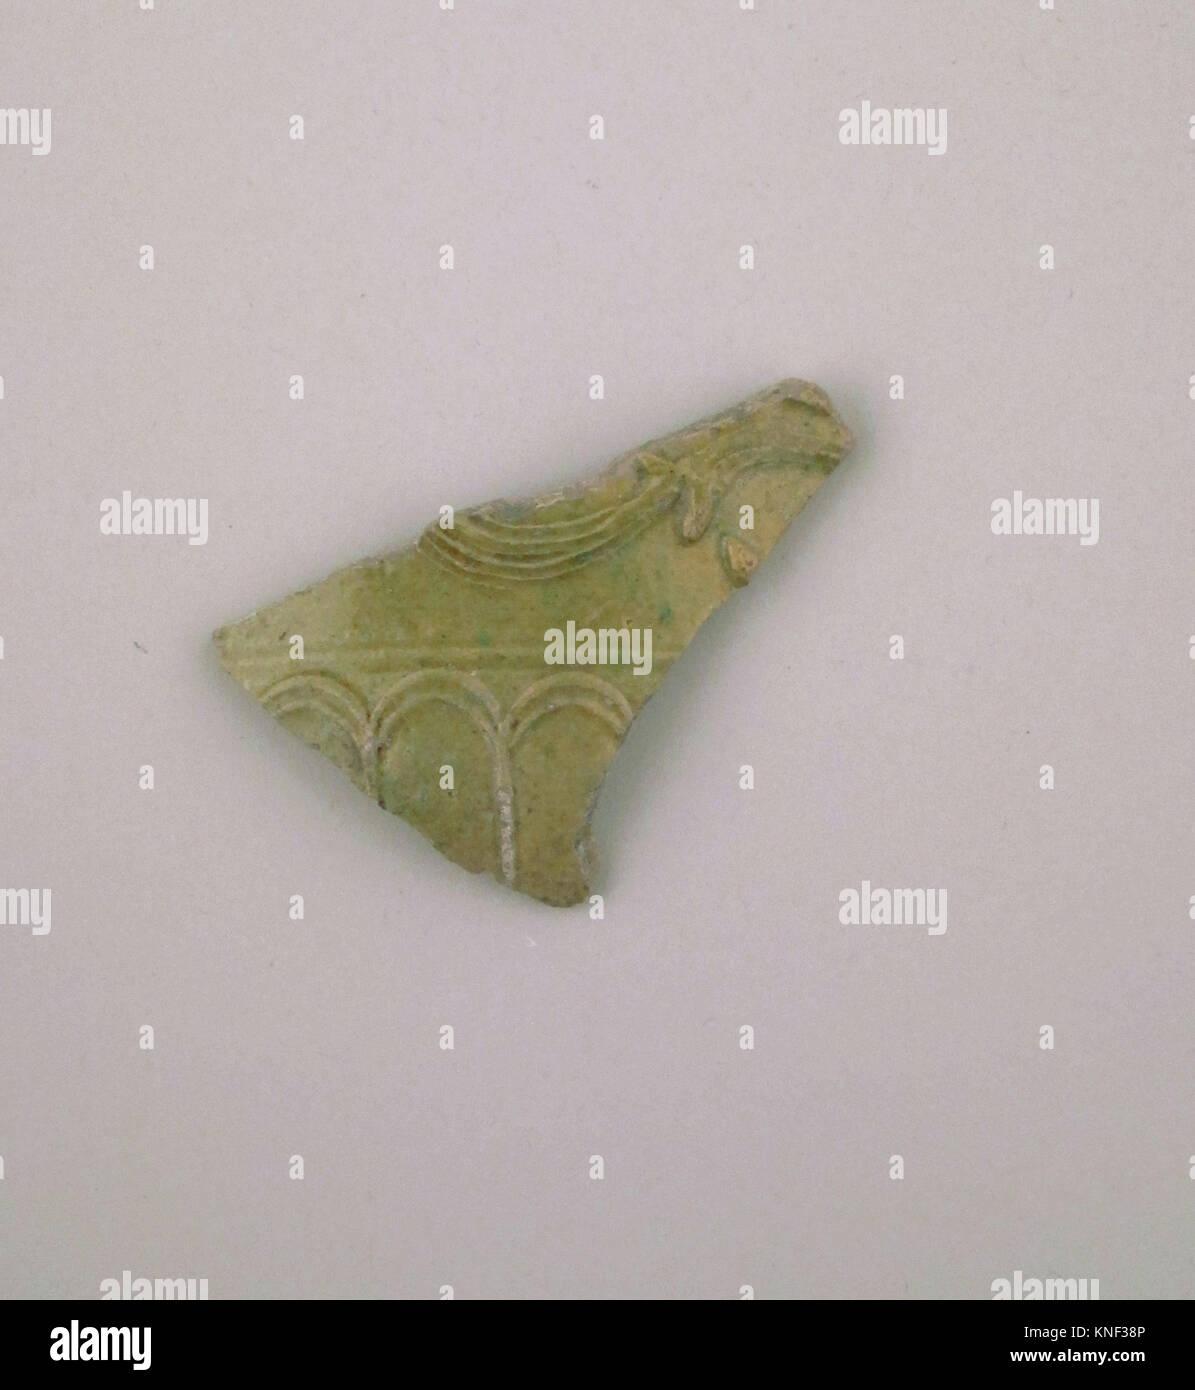 Vase fragment. Culture: Roman; Medium: Terracotta; Dimensions: width 6.60 cm; Classification: Vases; Credit Line: Stock Photo